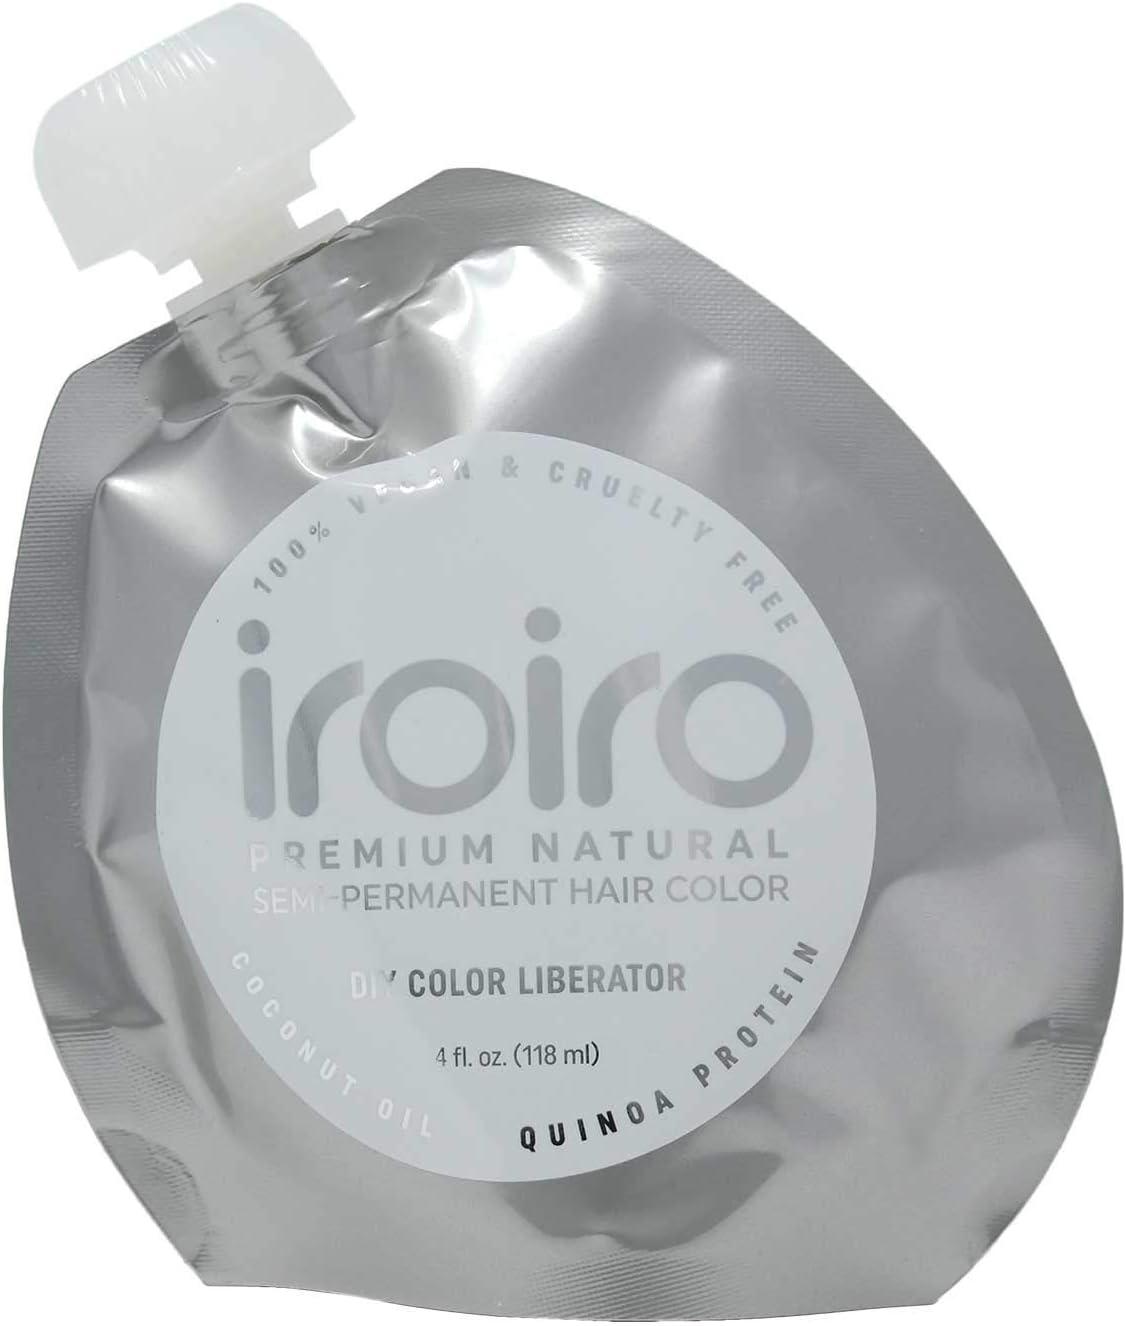 Diluidor liberador de color, tinte para el cabello de Iroiro, natural, semipermanente, calidad prémium, hazlo tu mismo